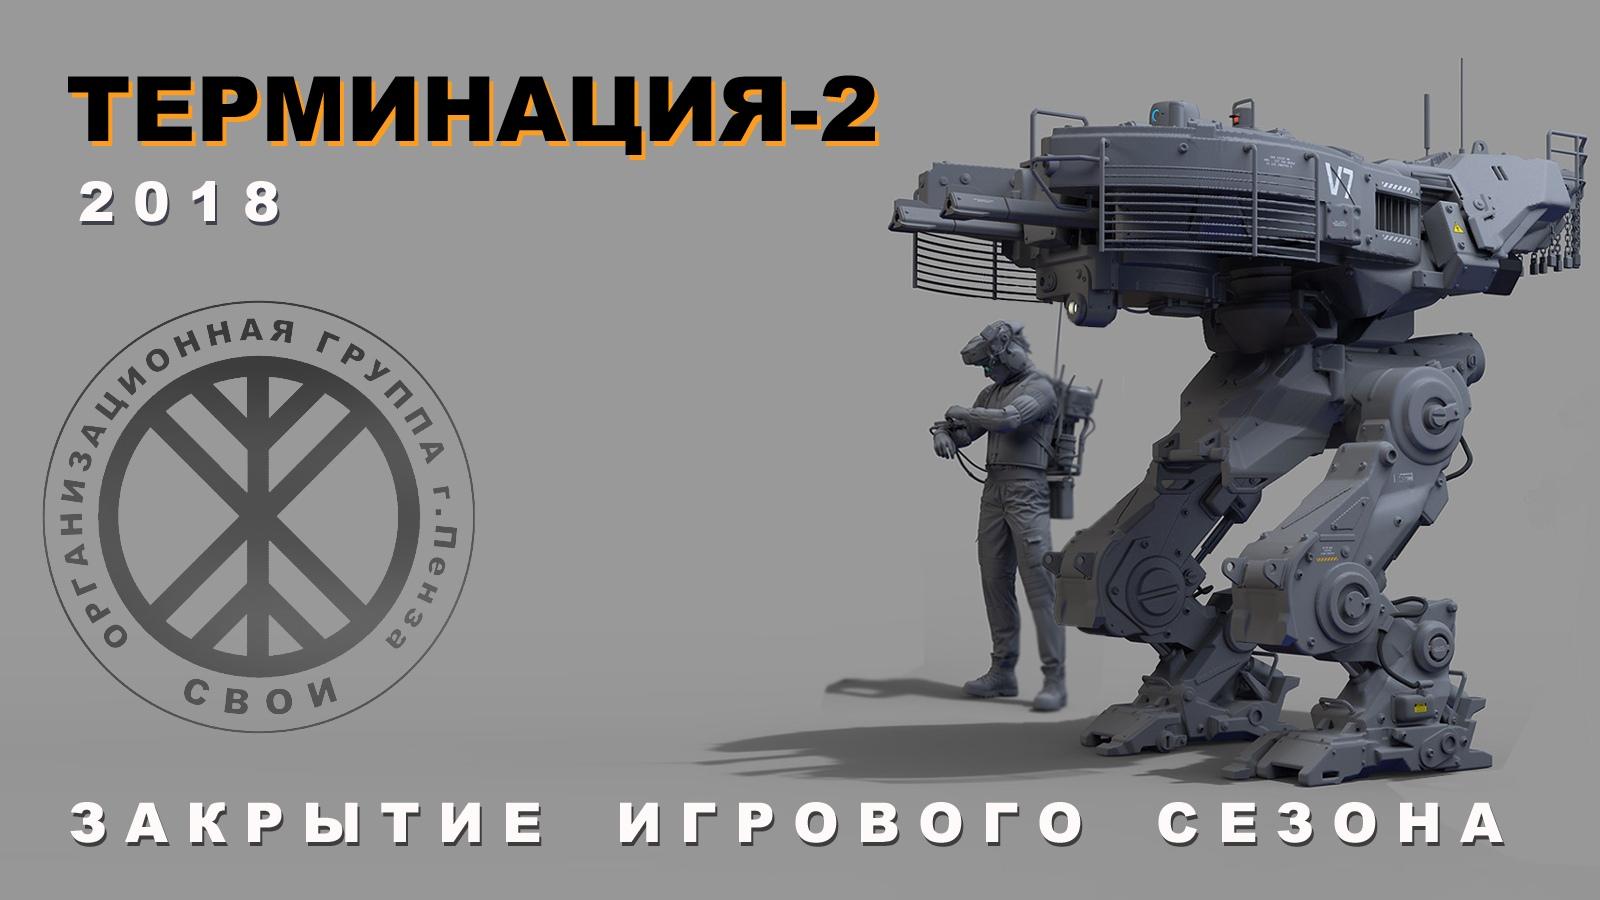 https://pp.userapi.com/c844416/v844416769/122156/x87wRl_WBC4.jpg